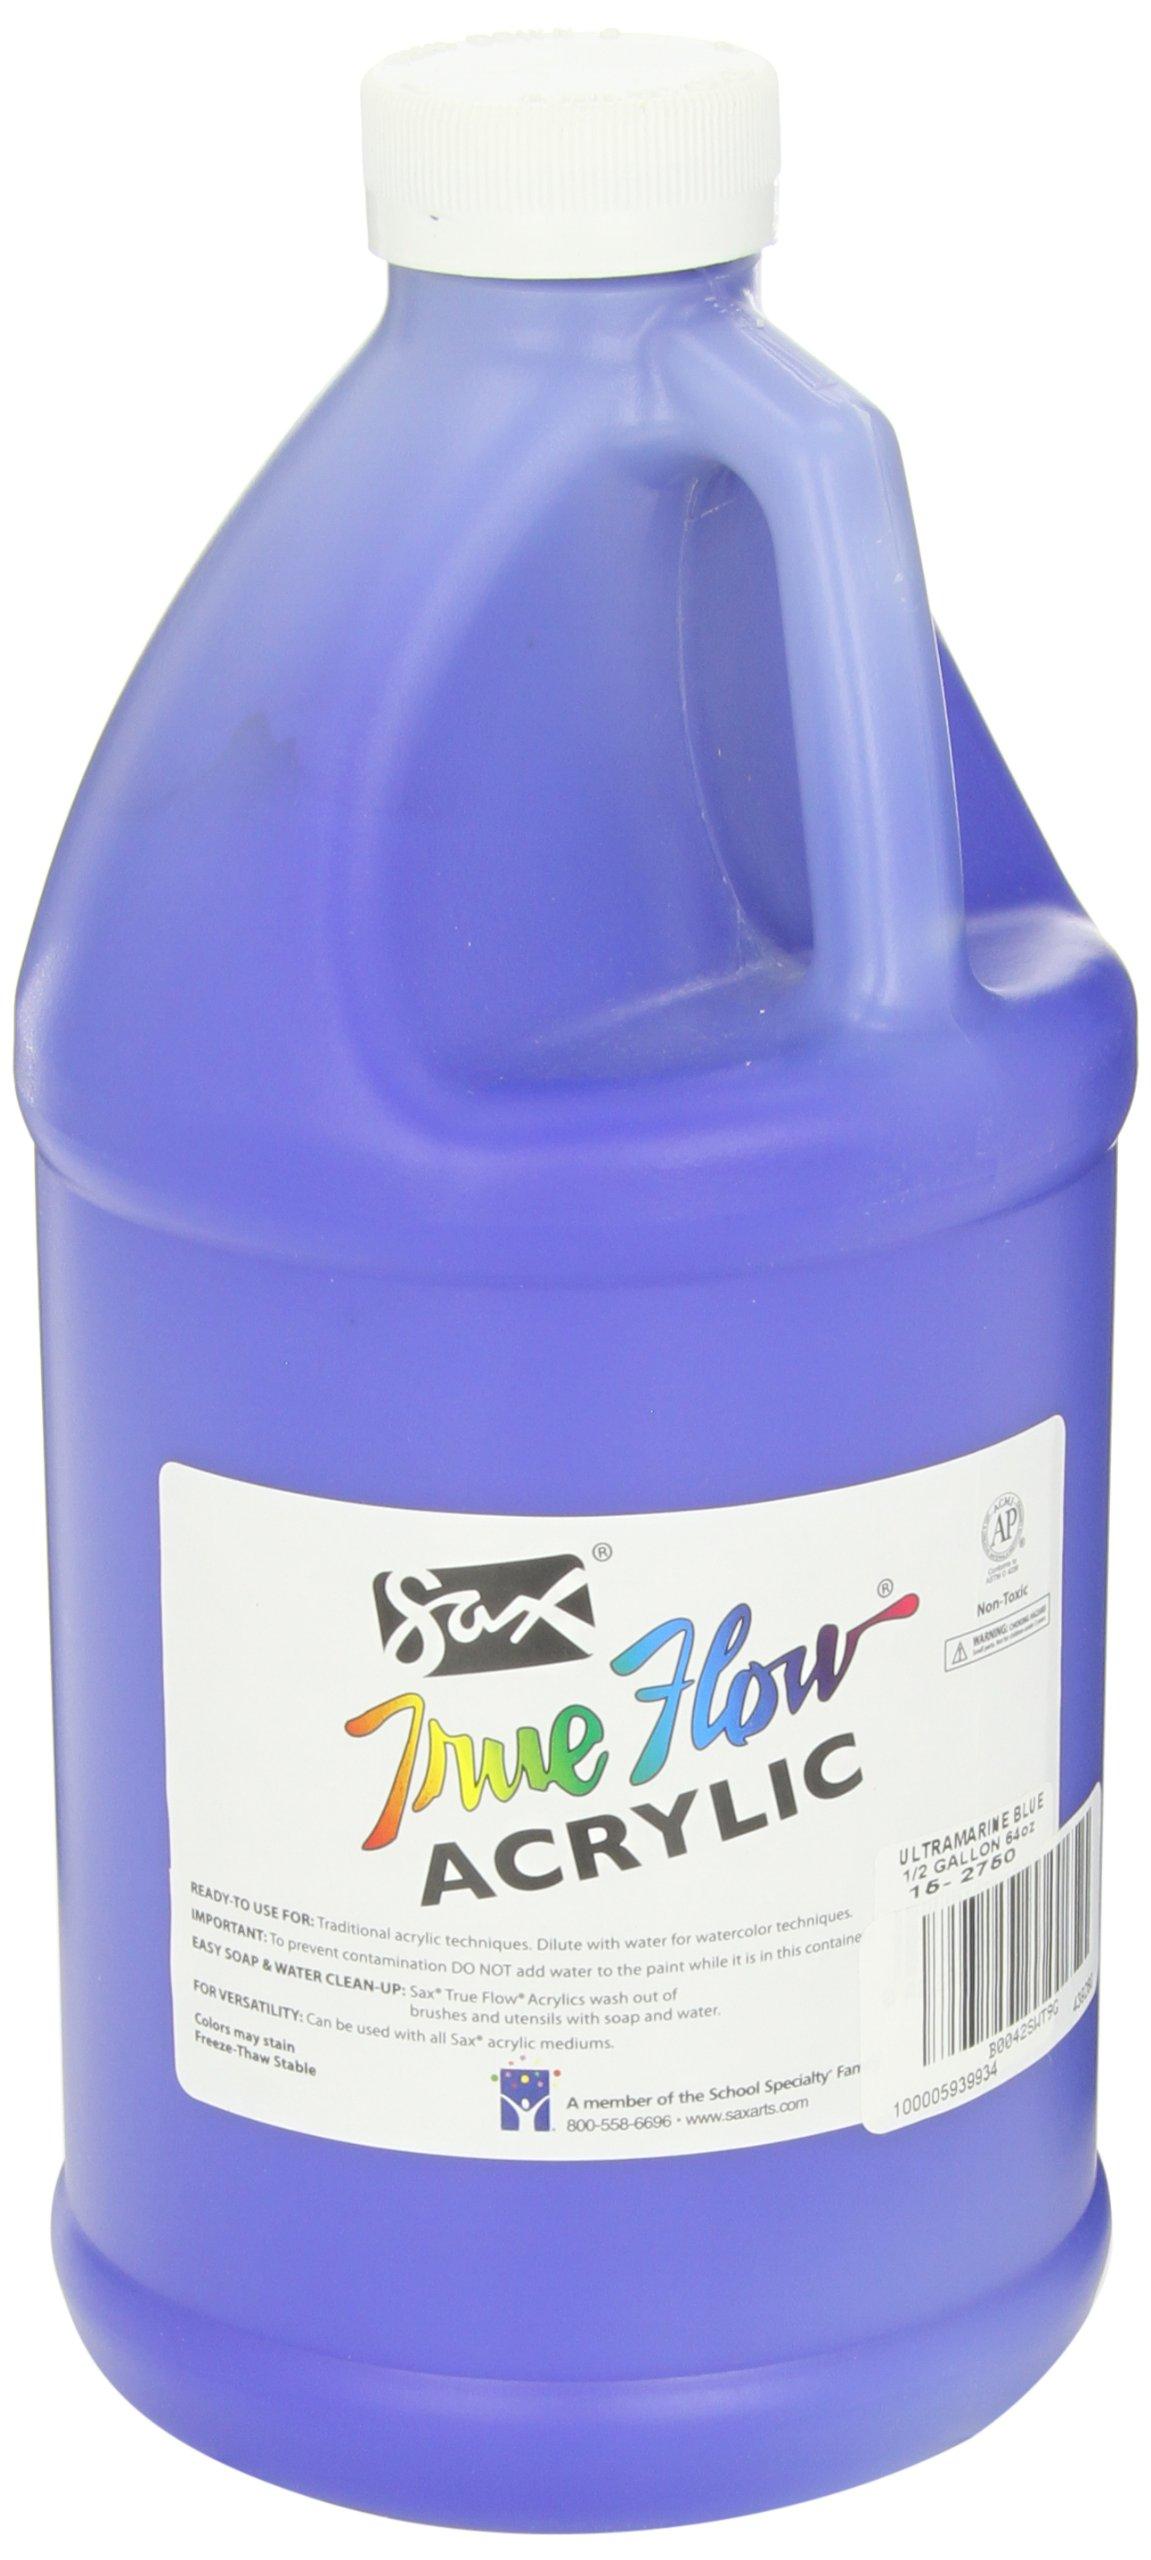 Sax True Flow Heavy Body Acrylic Paint, 1/2 Gallon, Ultramarine Blue - 439280